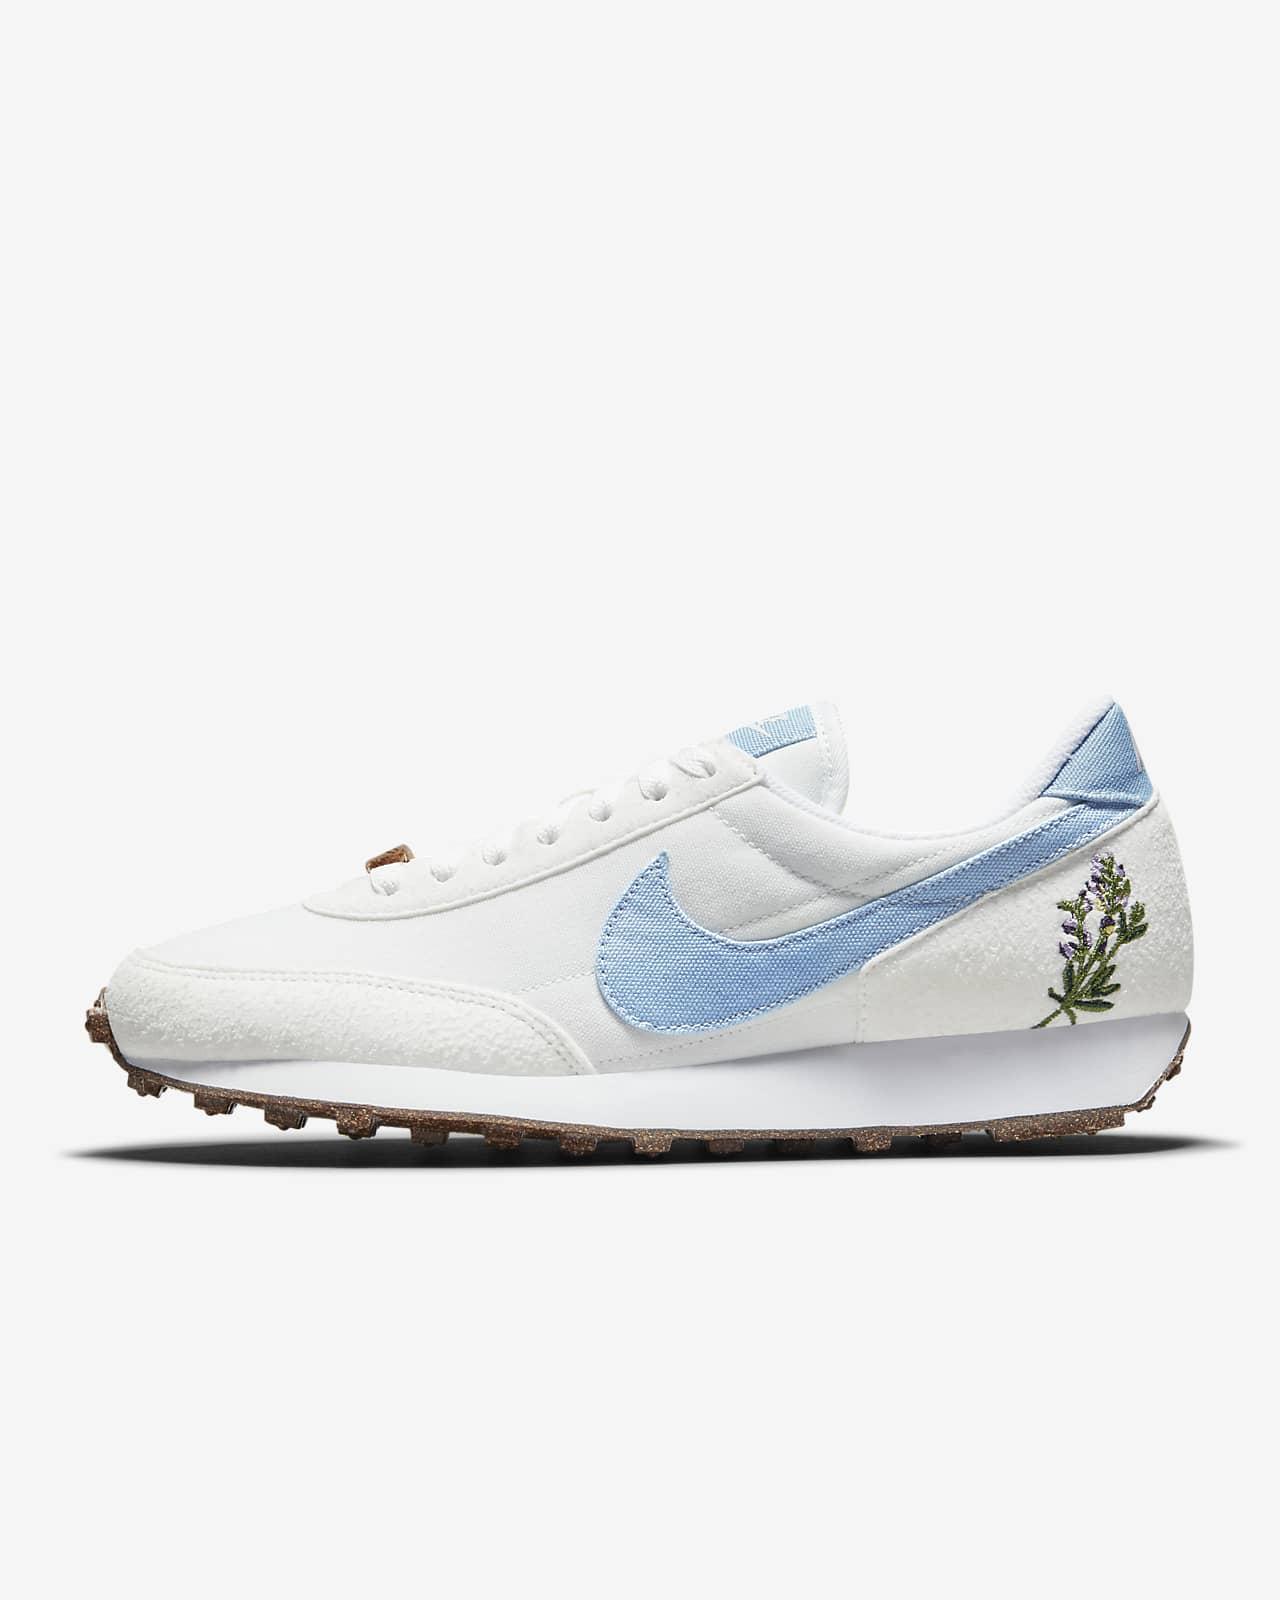 Burberry巴宝莉、Nike耐克... 秋冬明星款(名牌集锦)